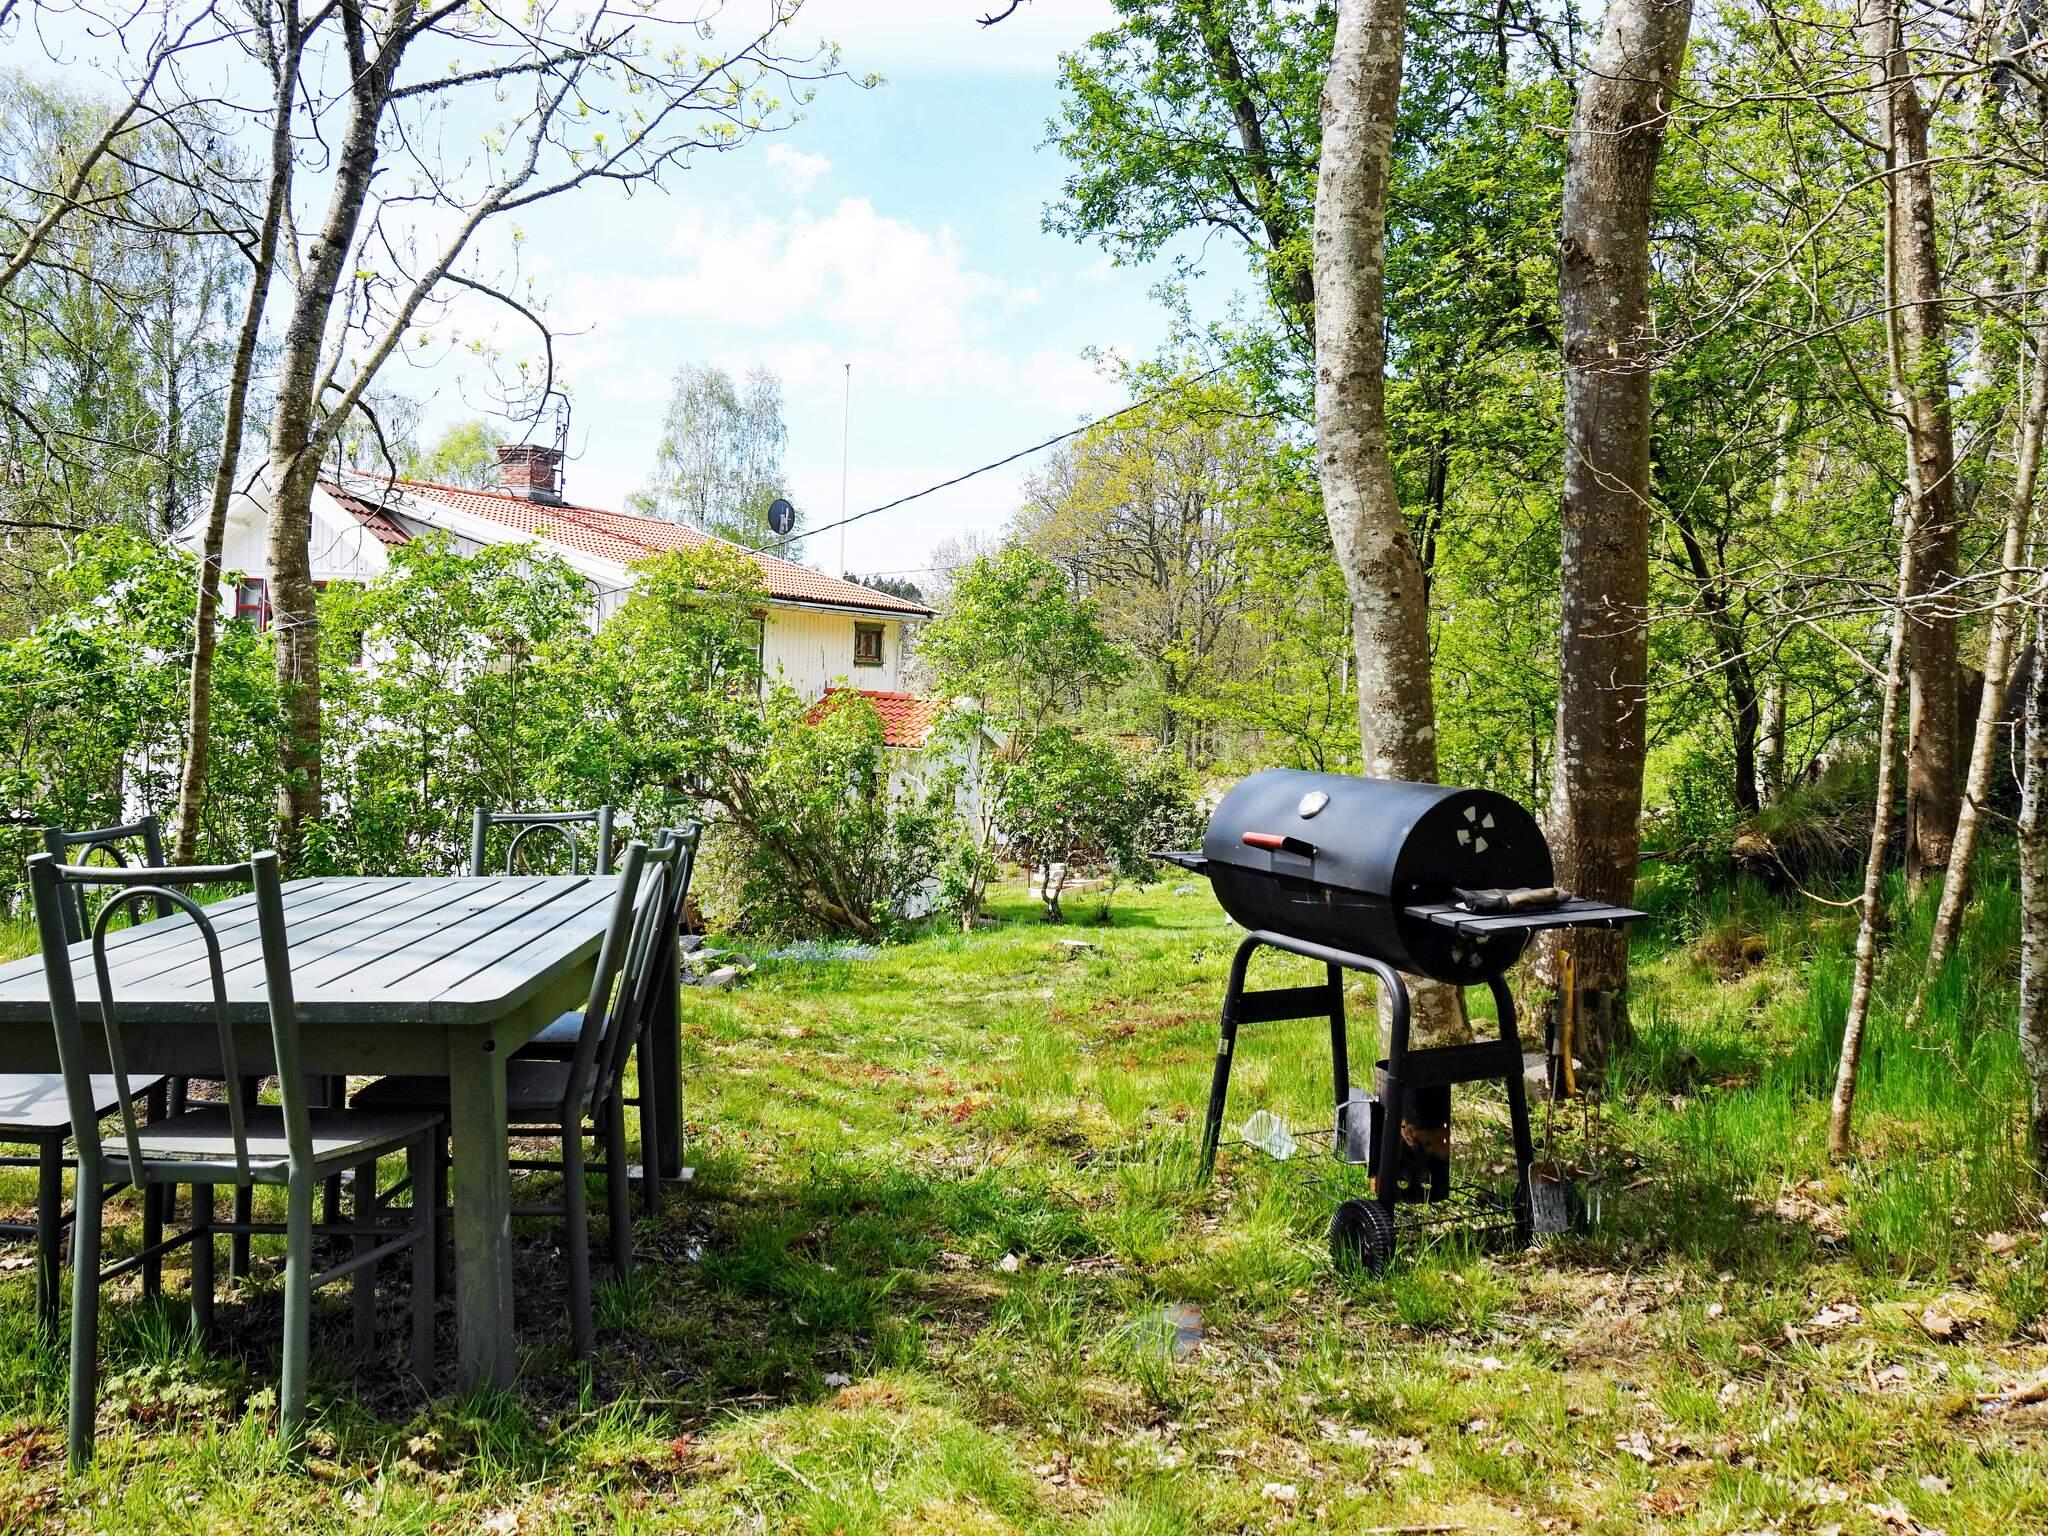 Ferienhaus Orust/Varekil (2621199), Varekil, Västra Götaland län, Westschweden, Schweden, Bild 19